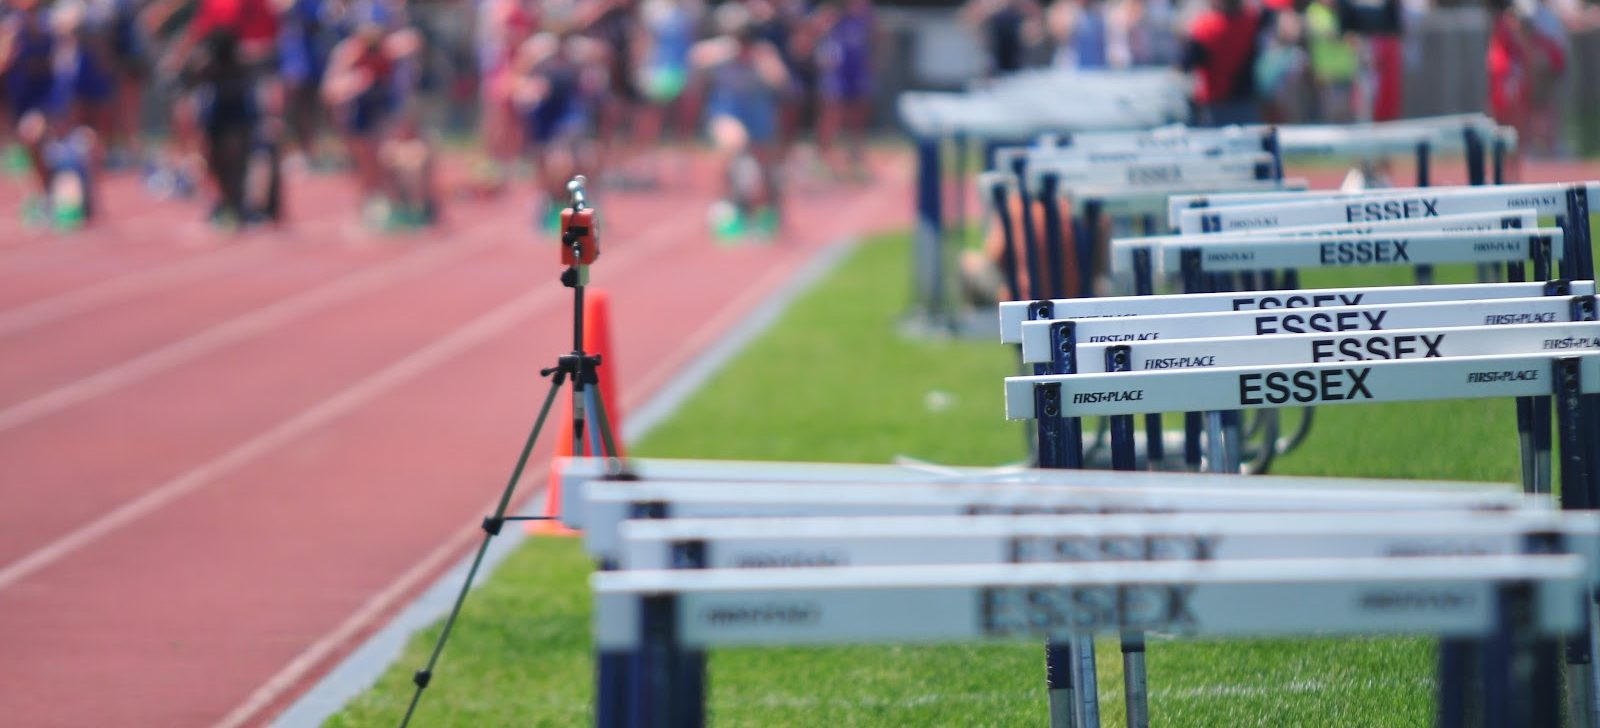 missouri invitational track meet results